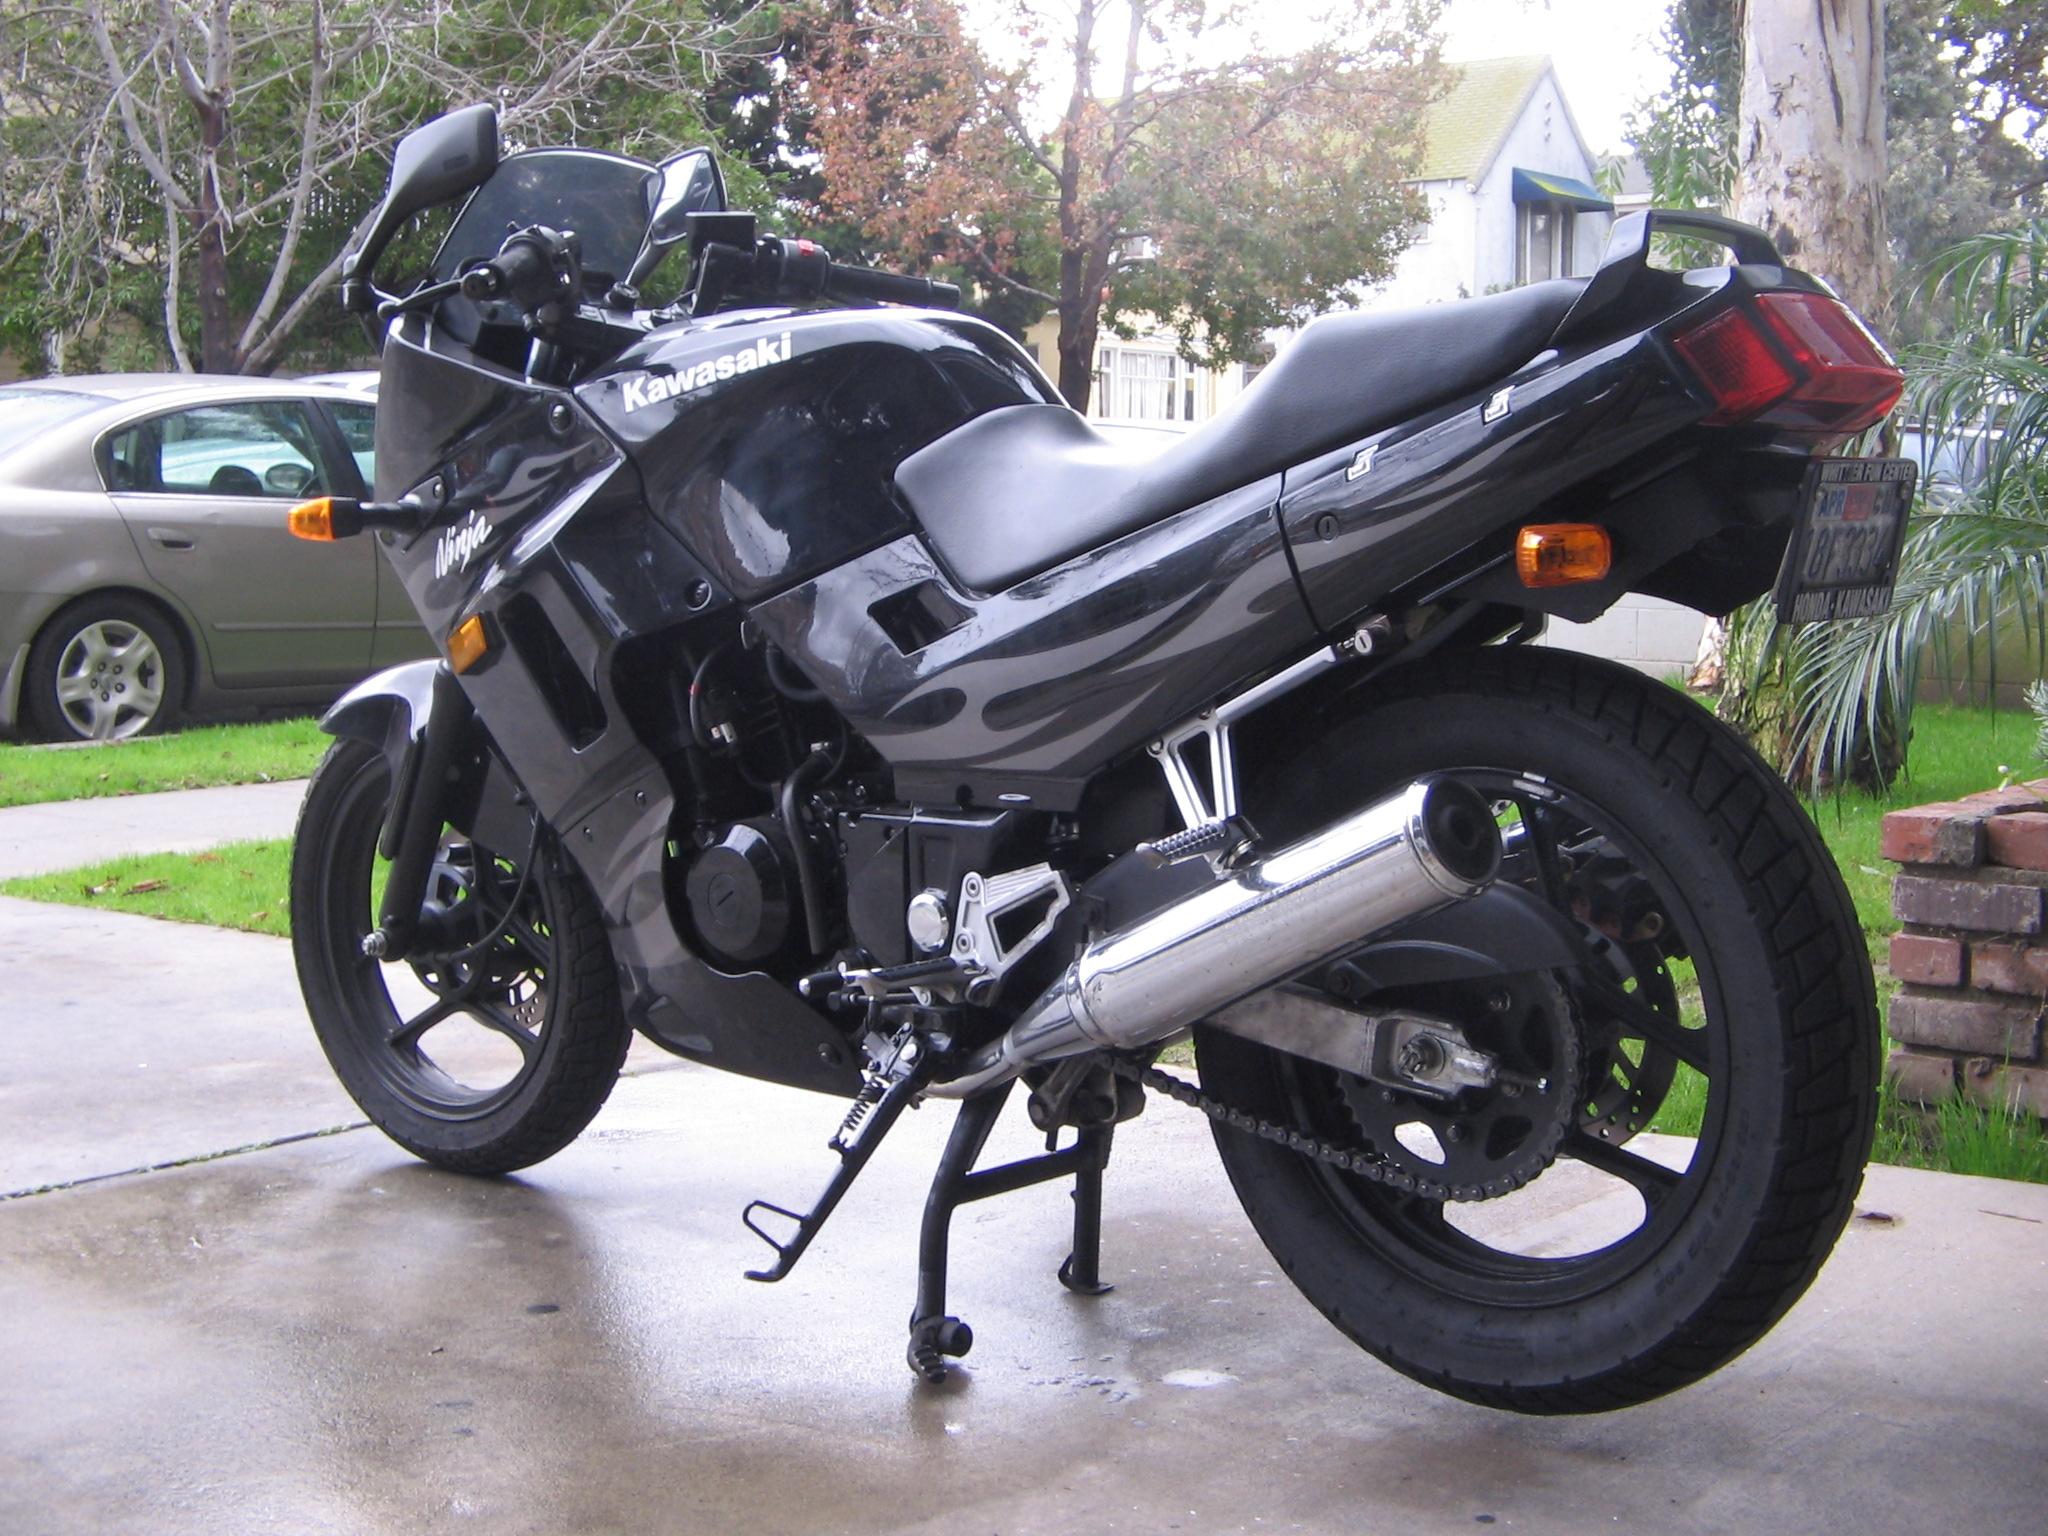 2006 Kawi Ninja 250 - 2500 - Long Beach CA - Sportbikes.net